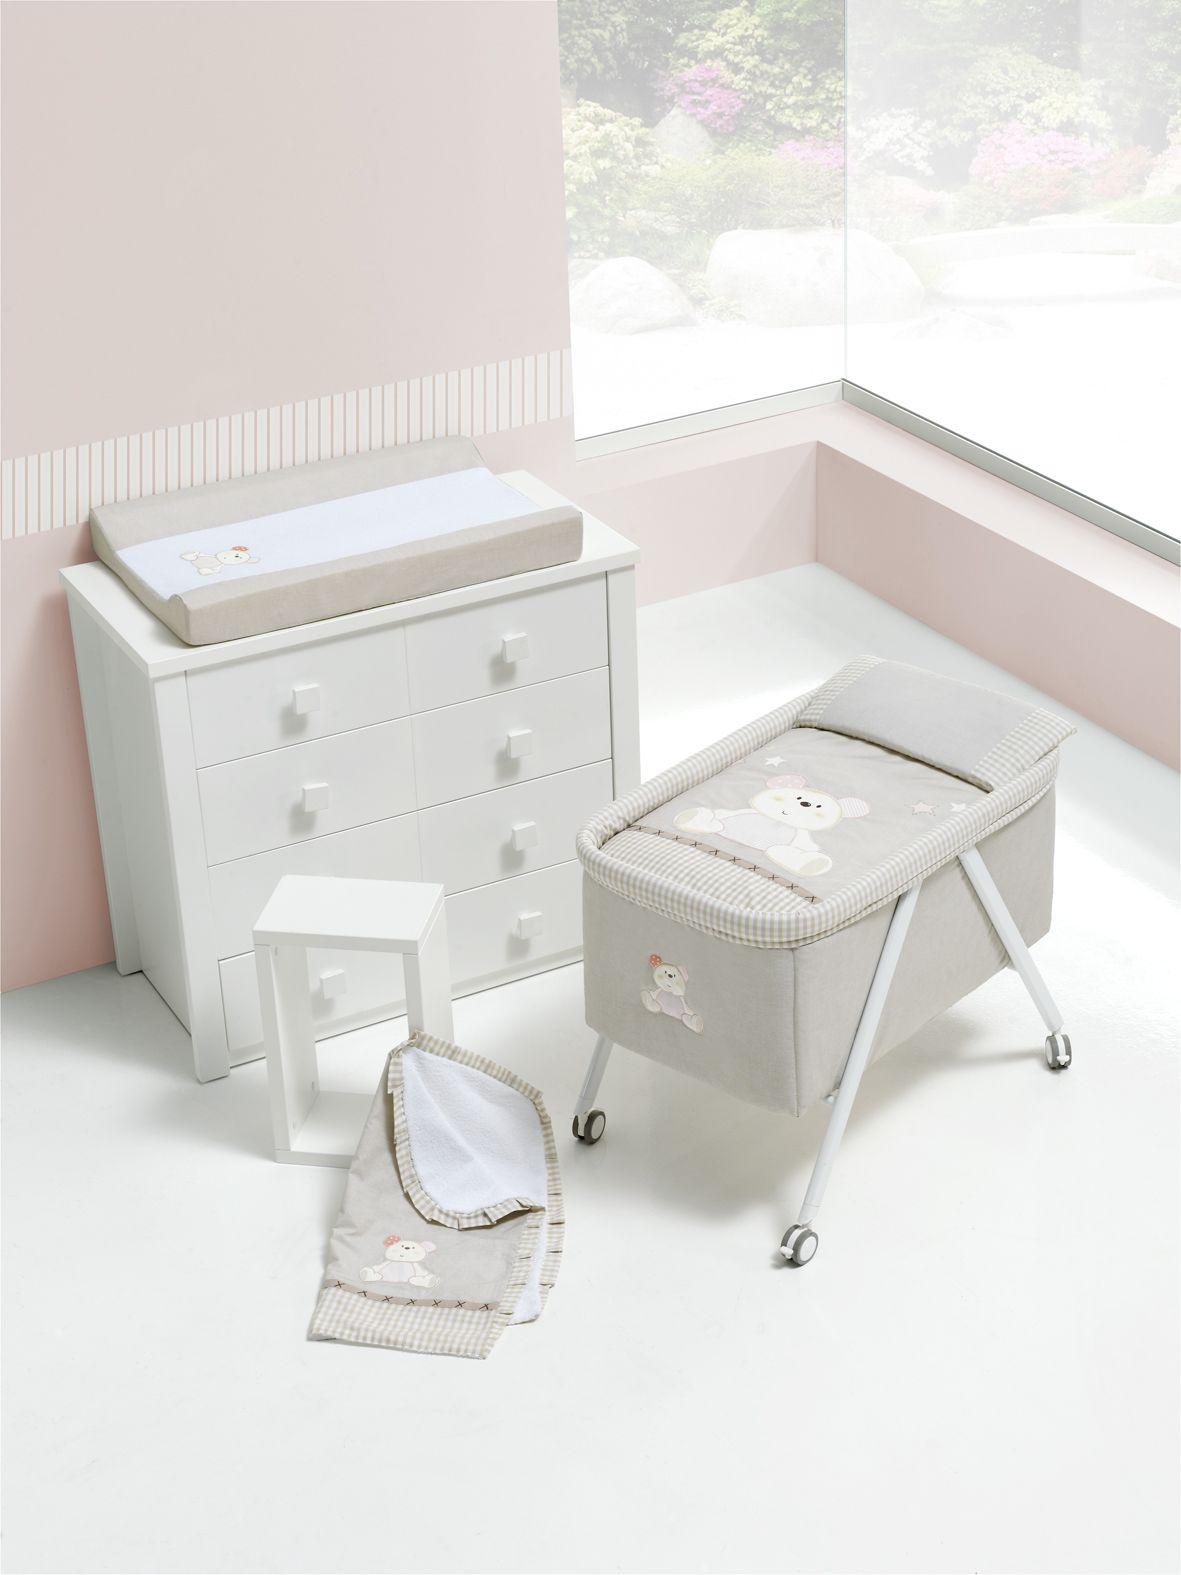 Babyzimmer inspiration  www.noonos.com #decoratie,#decoration,#dekoration,#inspiratie ...